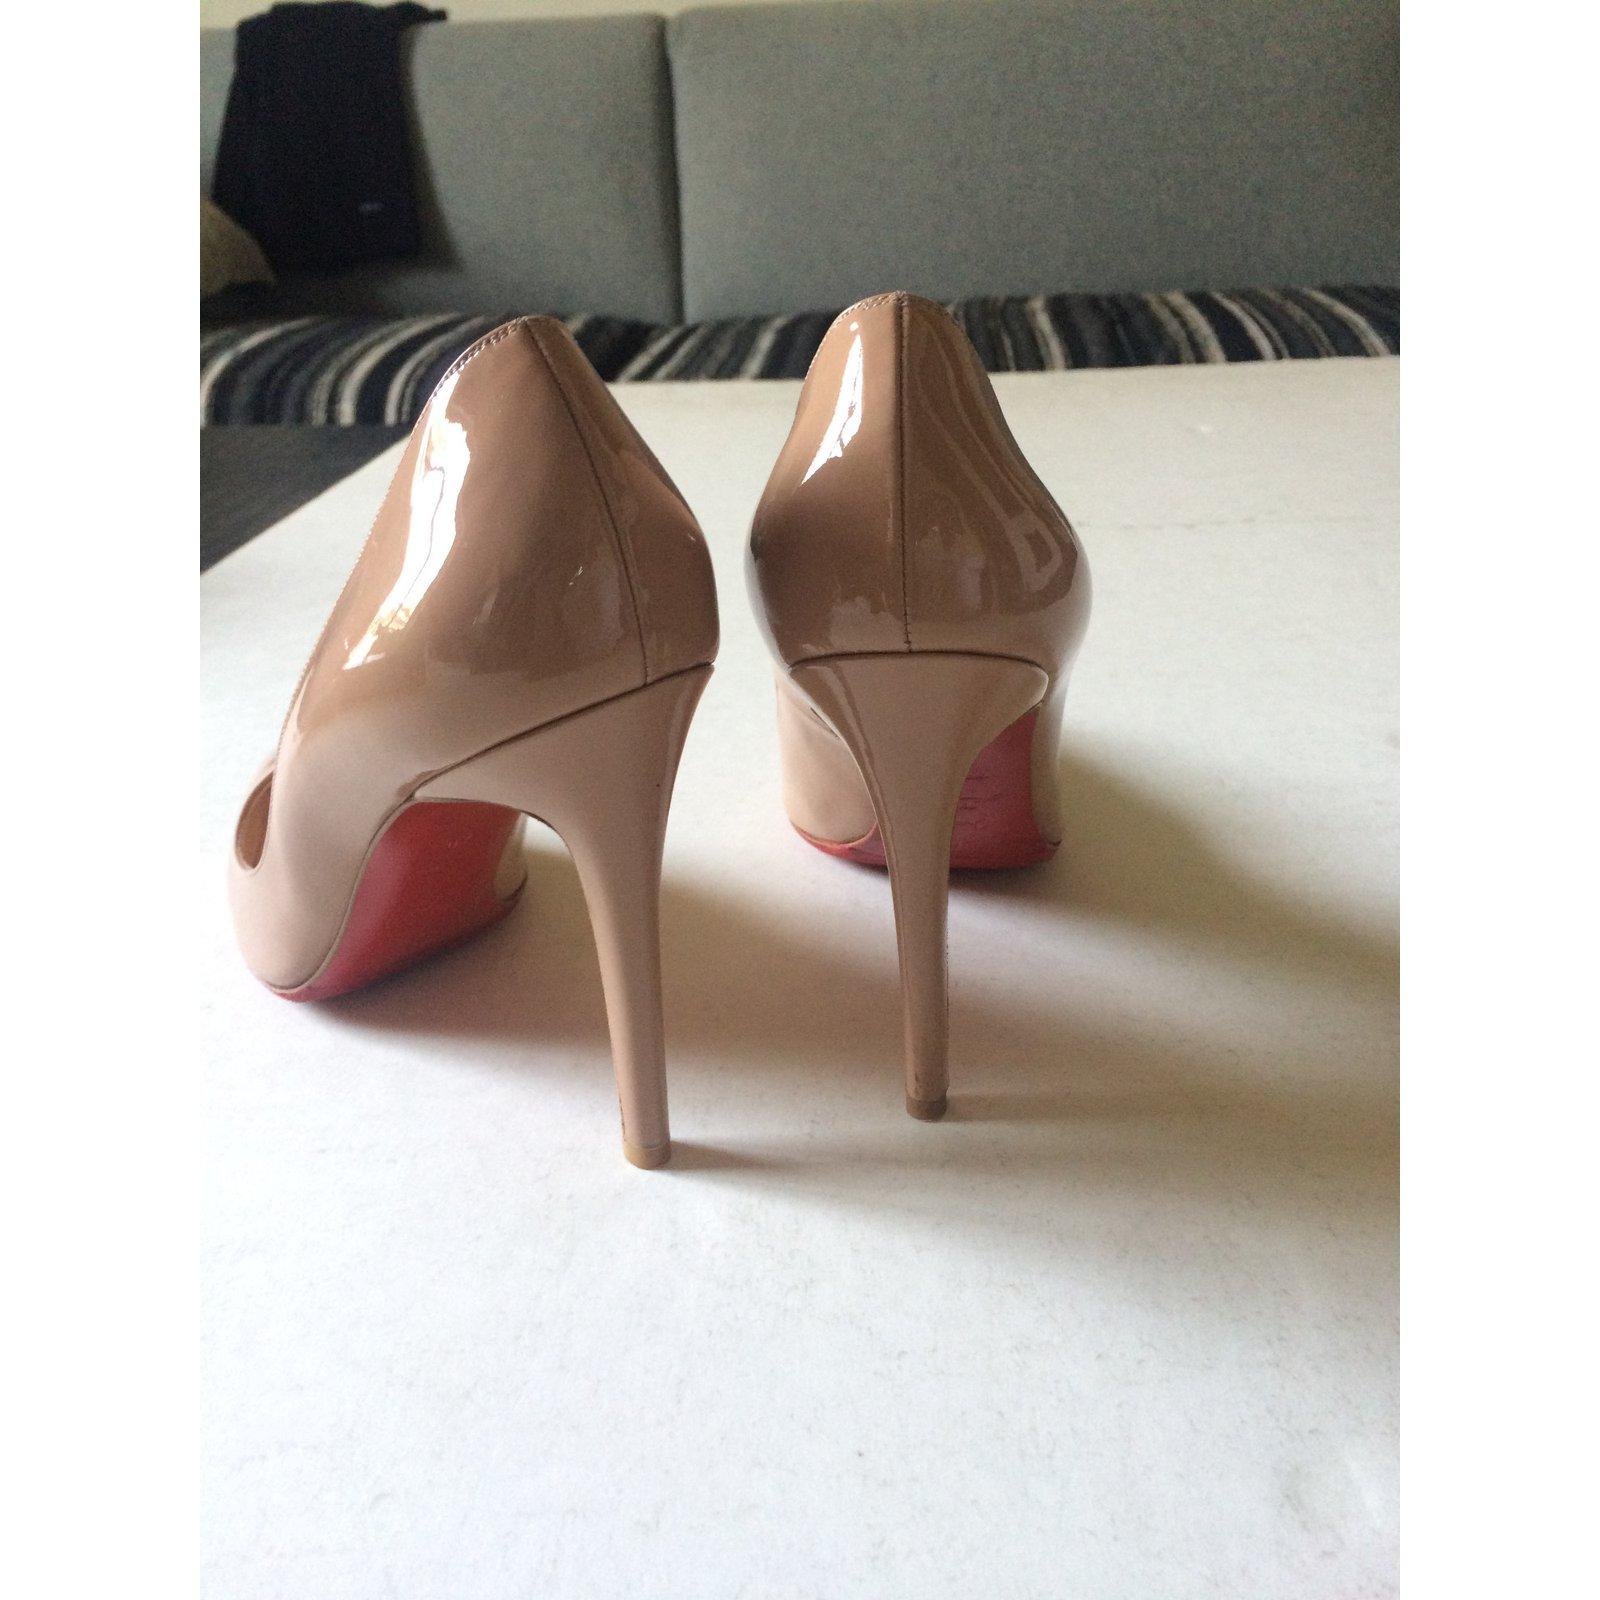 acheter en ligne 57881 18d74 Pigalle 10 cm Nude Vernis